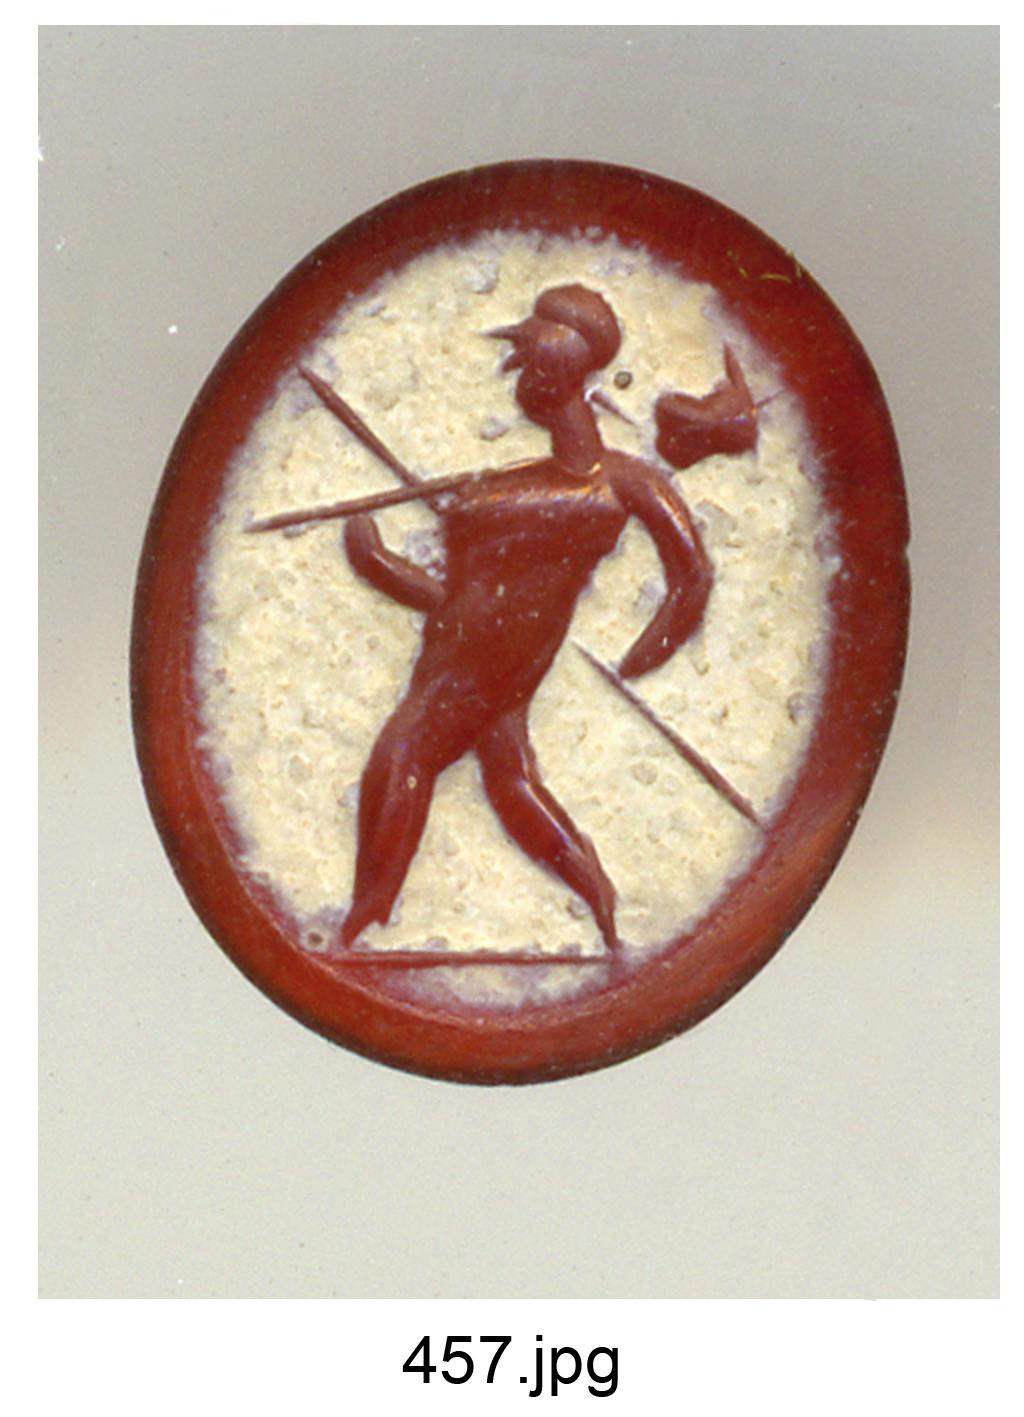 Marte Gravidus (gemma) - produzione romana (sec. II)